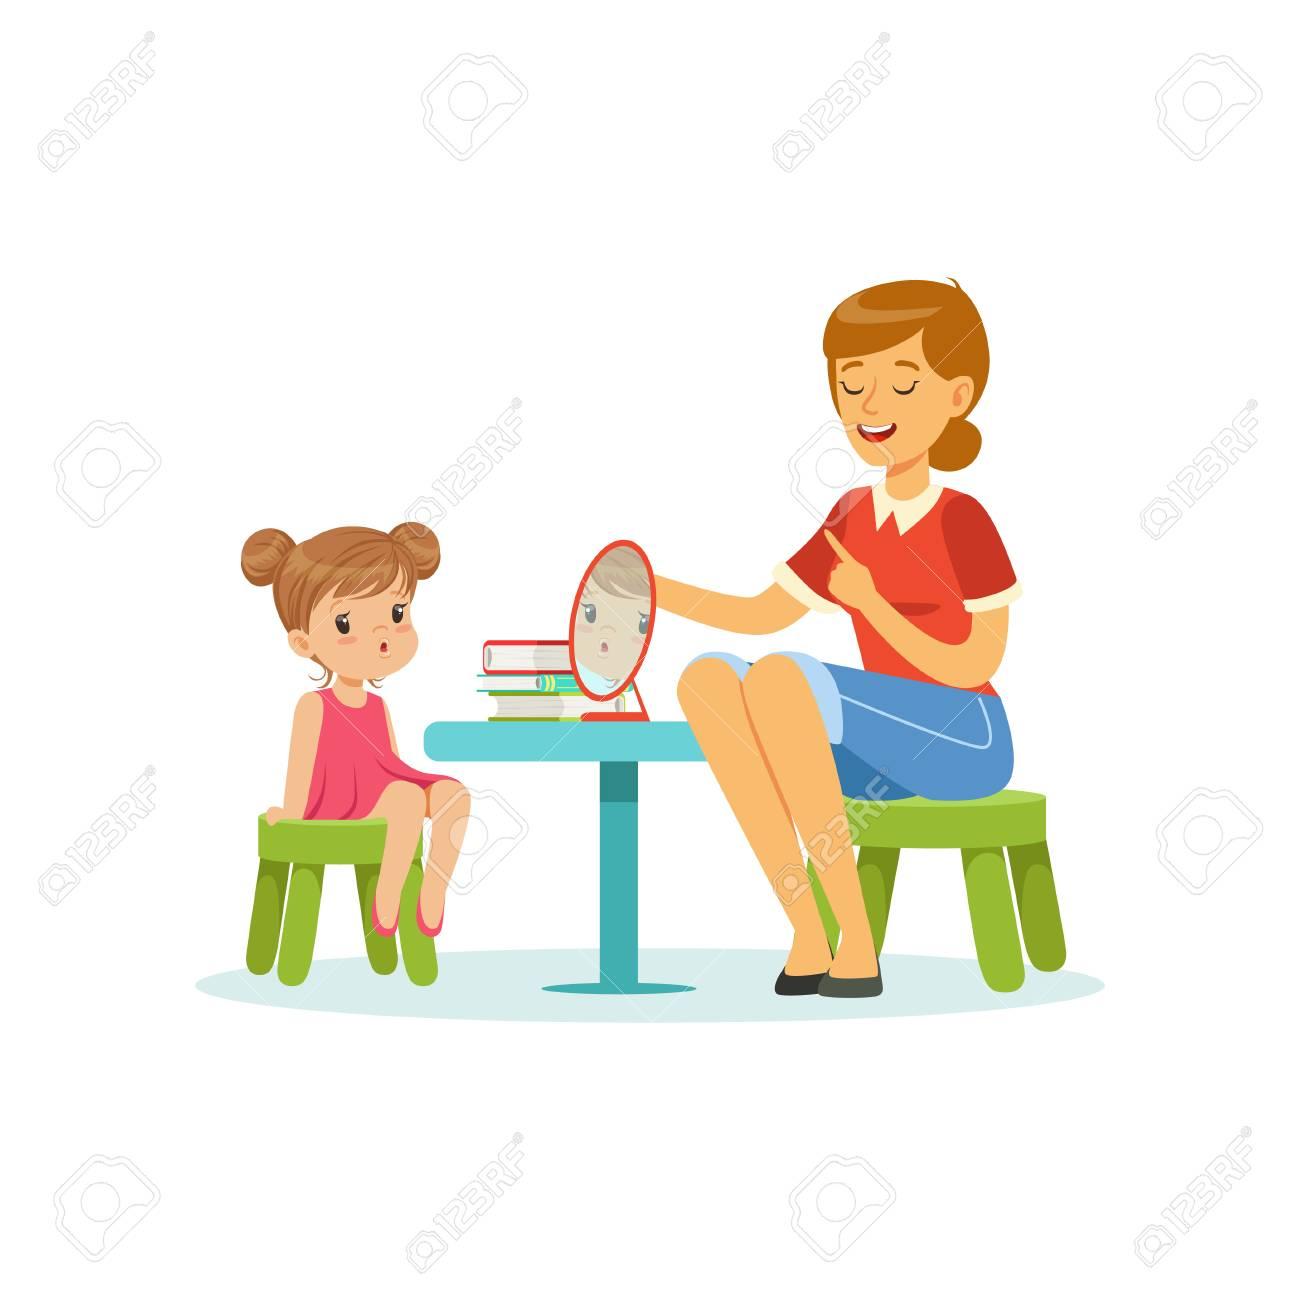 Speech and language specialist teaching little girl correct pronunciation of letters. Child speech sound development - 90329219